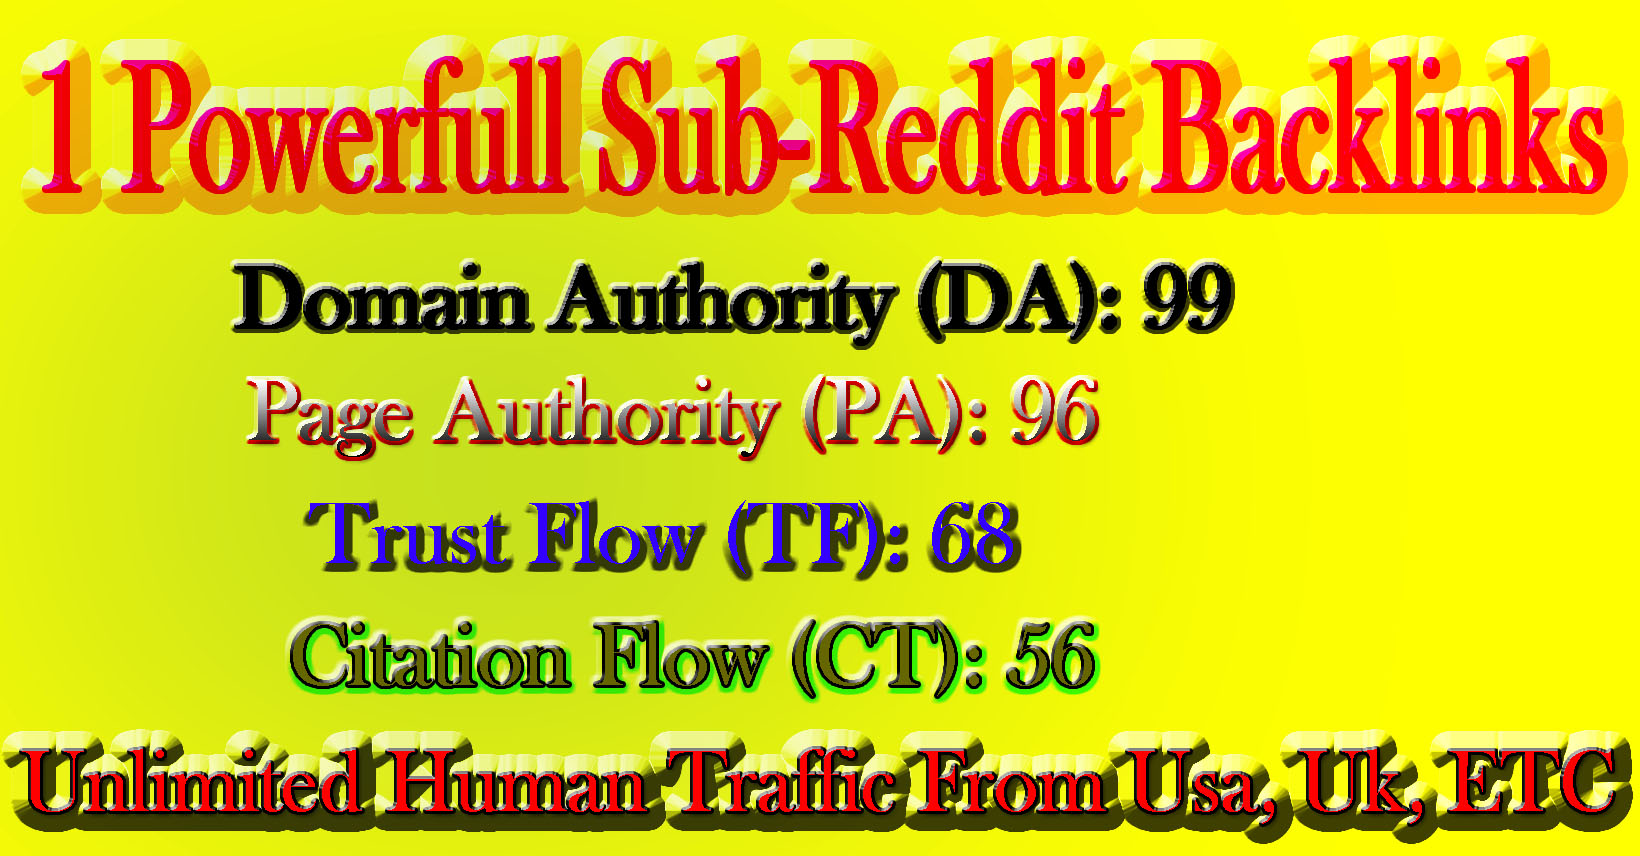 1 Powerfull Category Based-Reddit Backlinks for your link